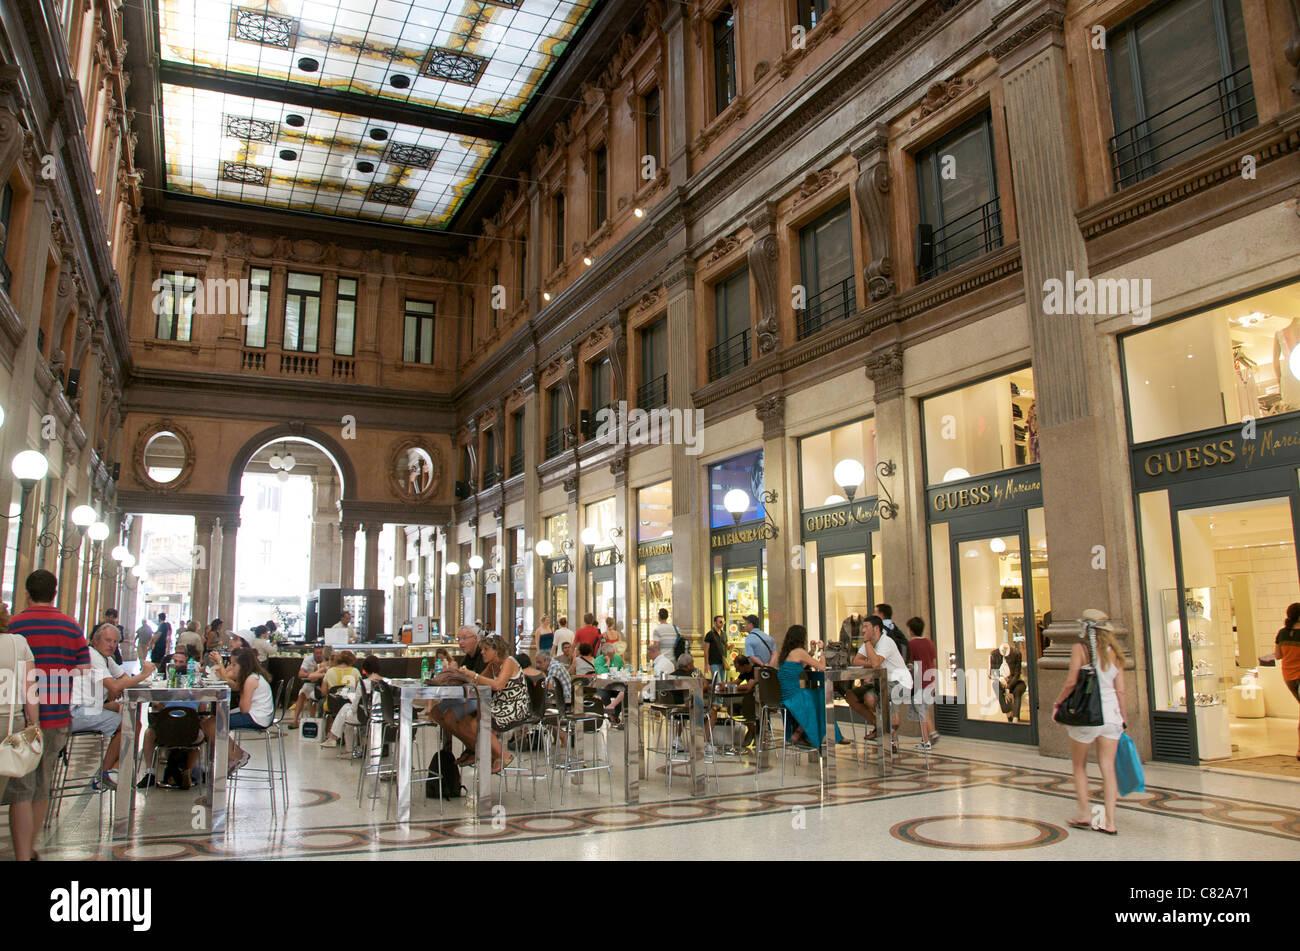 Shopping arcade, Rome, Italy, Europe - Stock Image